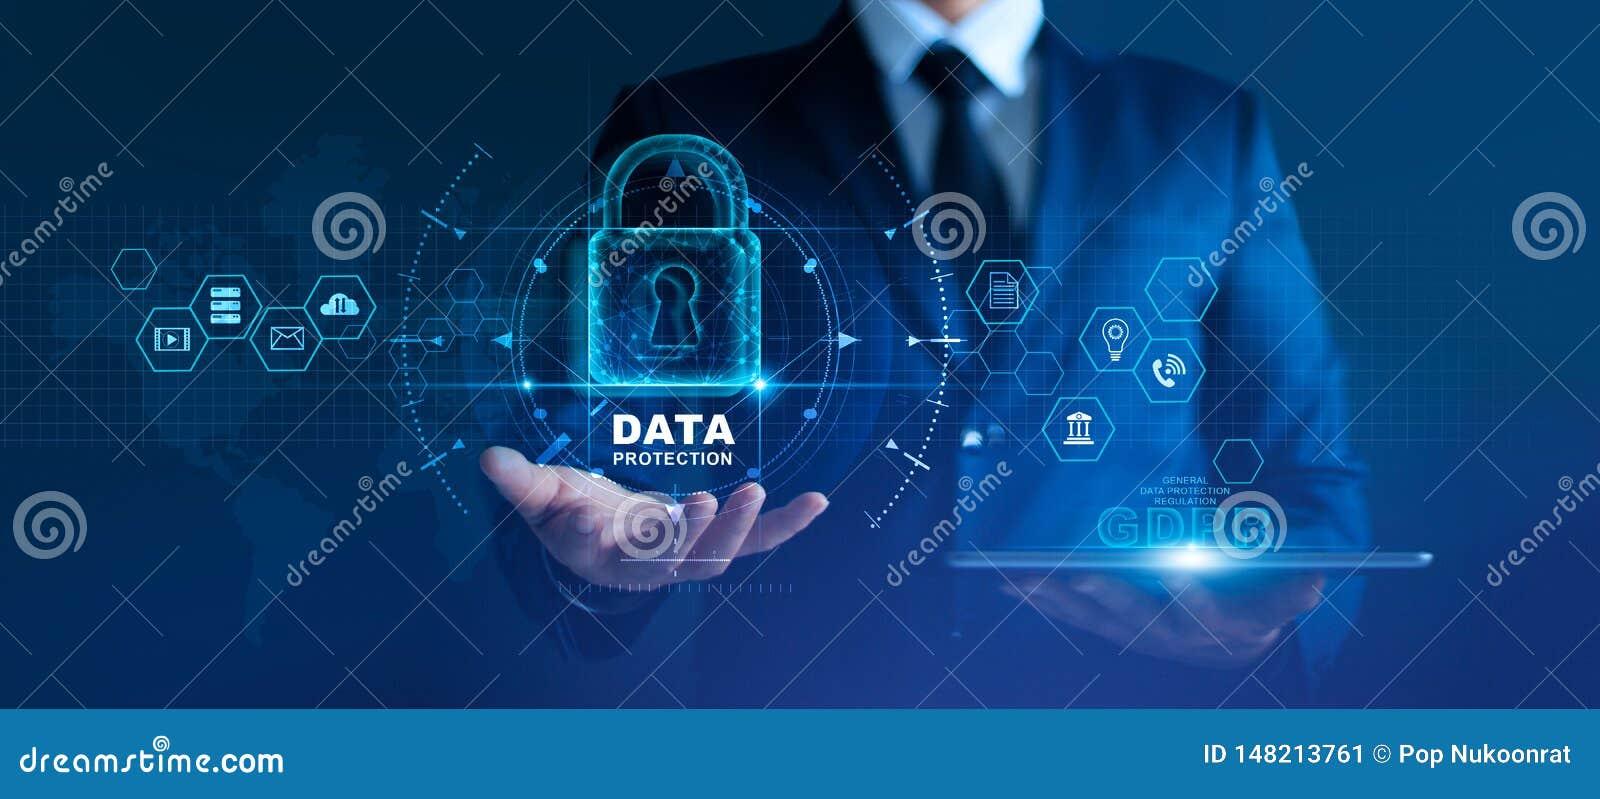 Begrepp f?r avskildhet f?r dataskydd GDPR EU Cybers?kerhetsn?tverk Skyddande data f?r aff?rsman